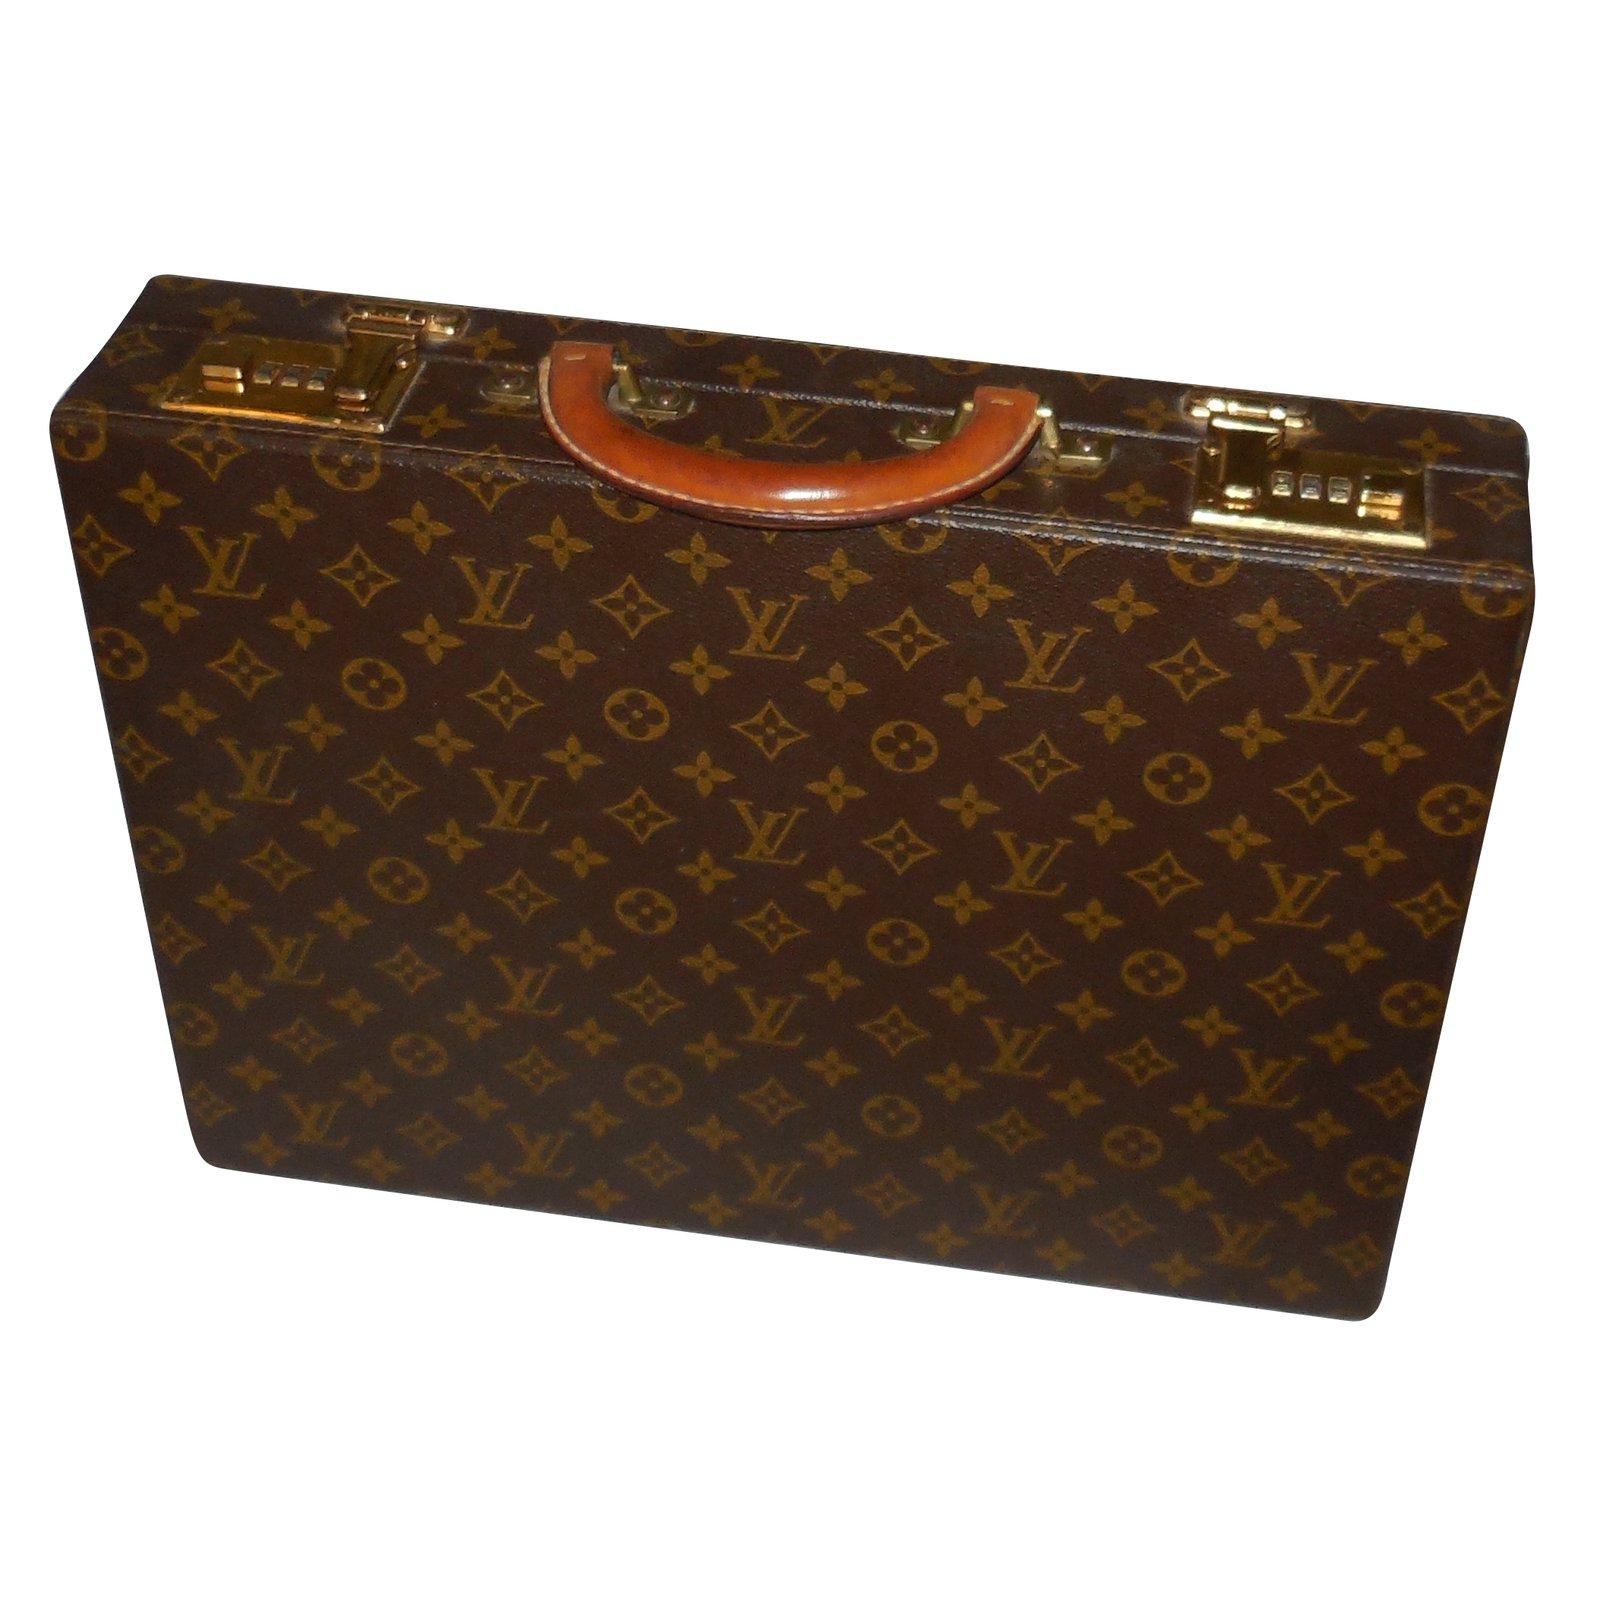 Petite maroquinerie Louis Vuitton Petite maroquinerie Plastique Autre  ref.50938 a61dc750ebf